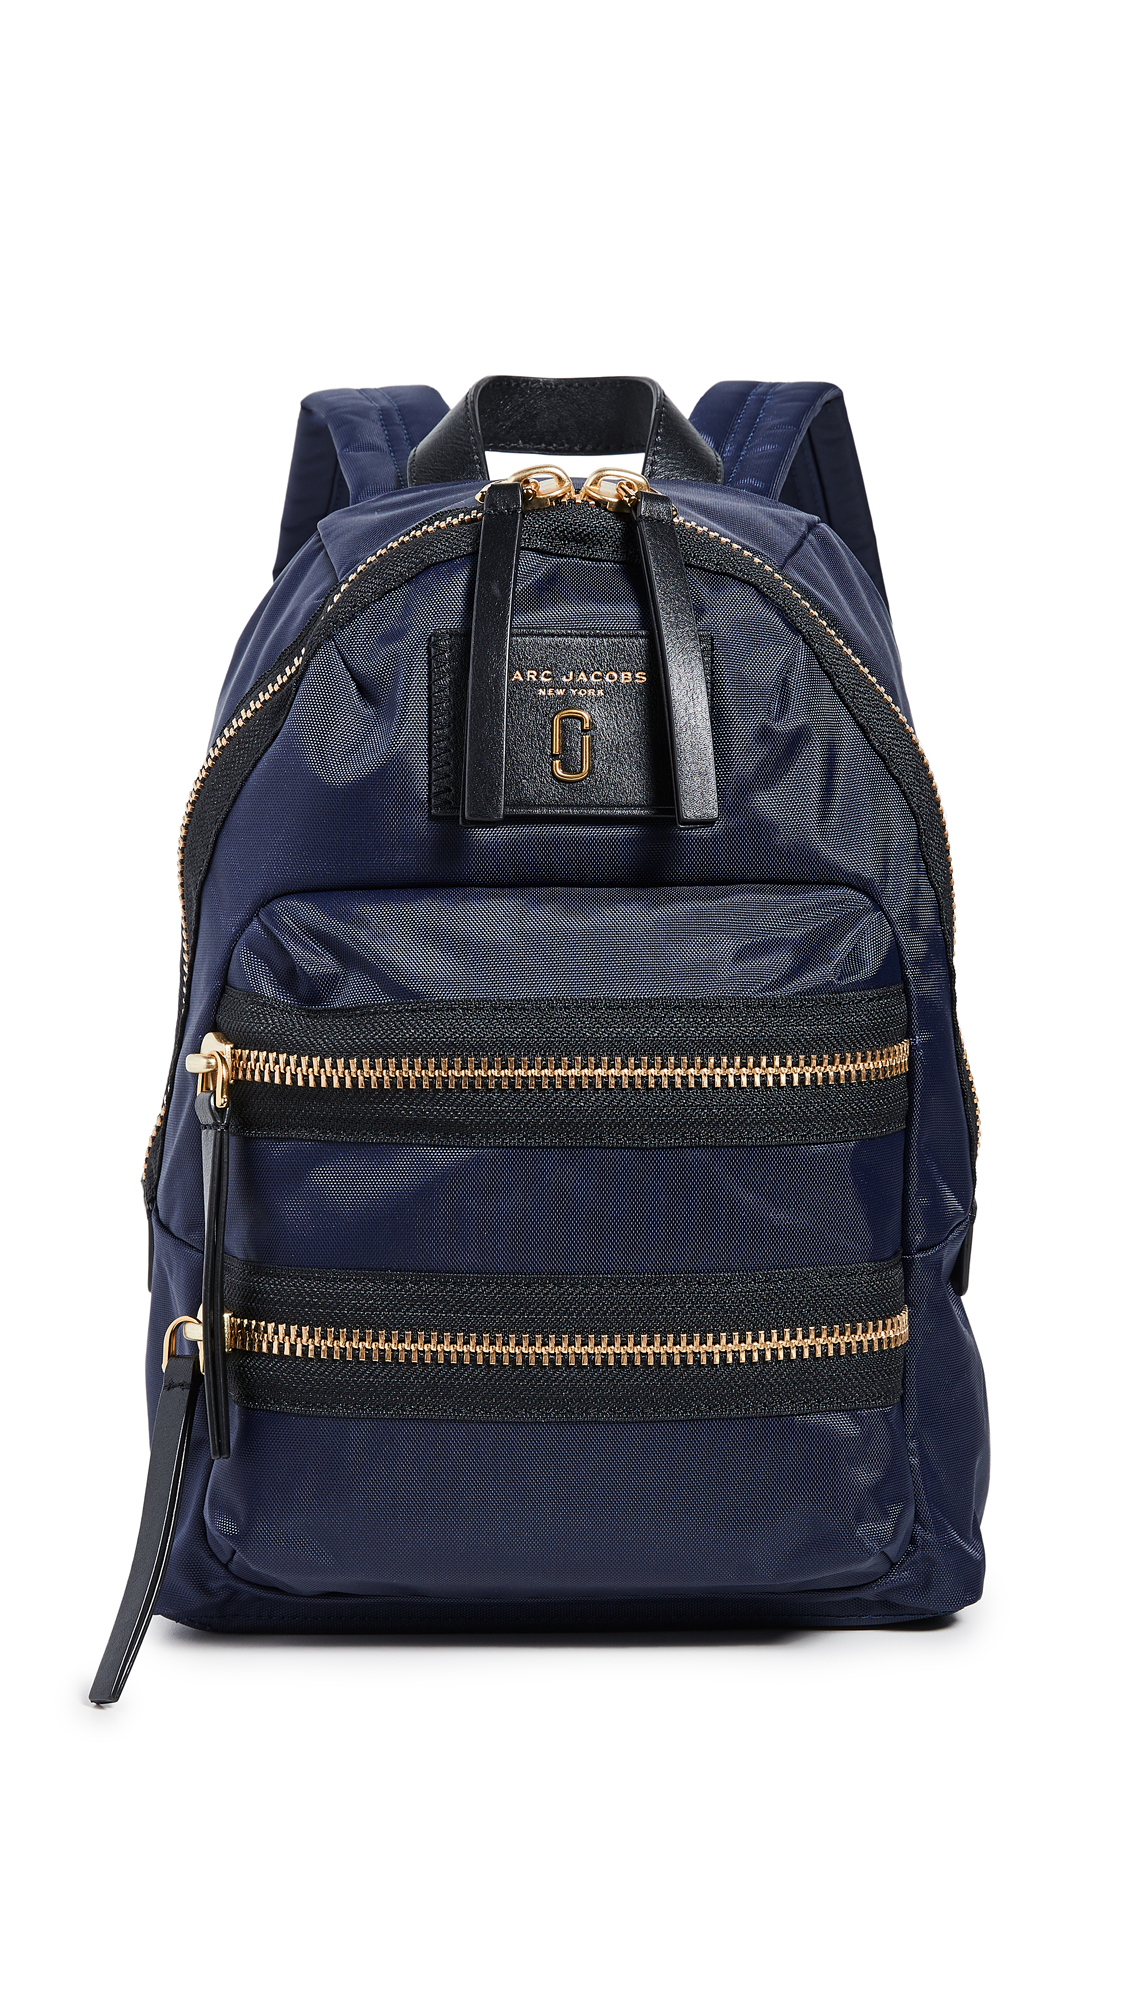 Marc Jacobs Mini Nylon Biker Backpack - Midnight Blue